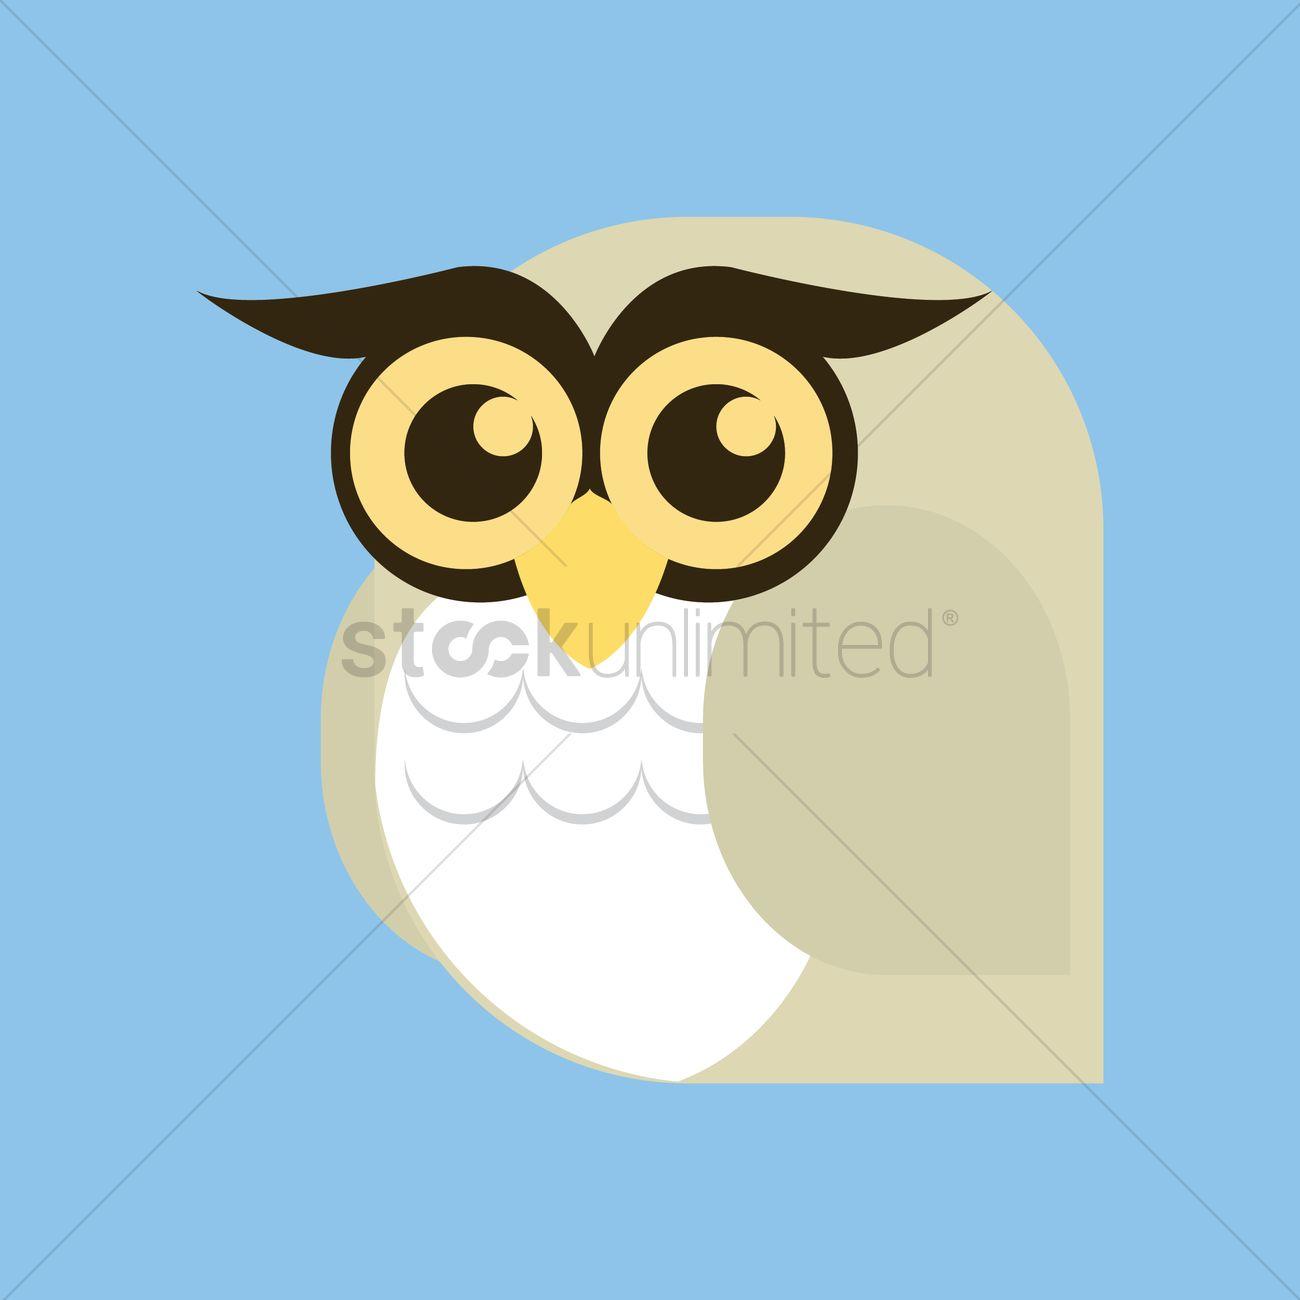 1300x1300 Free Owl Vector Image